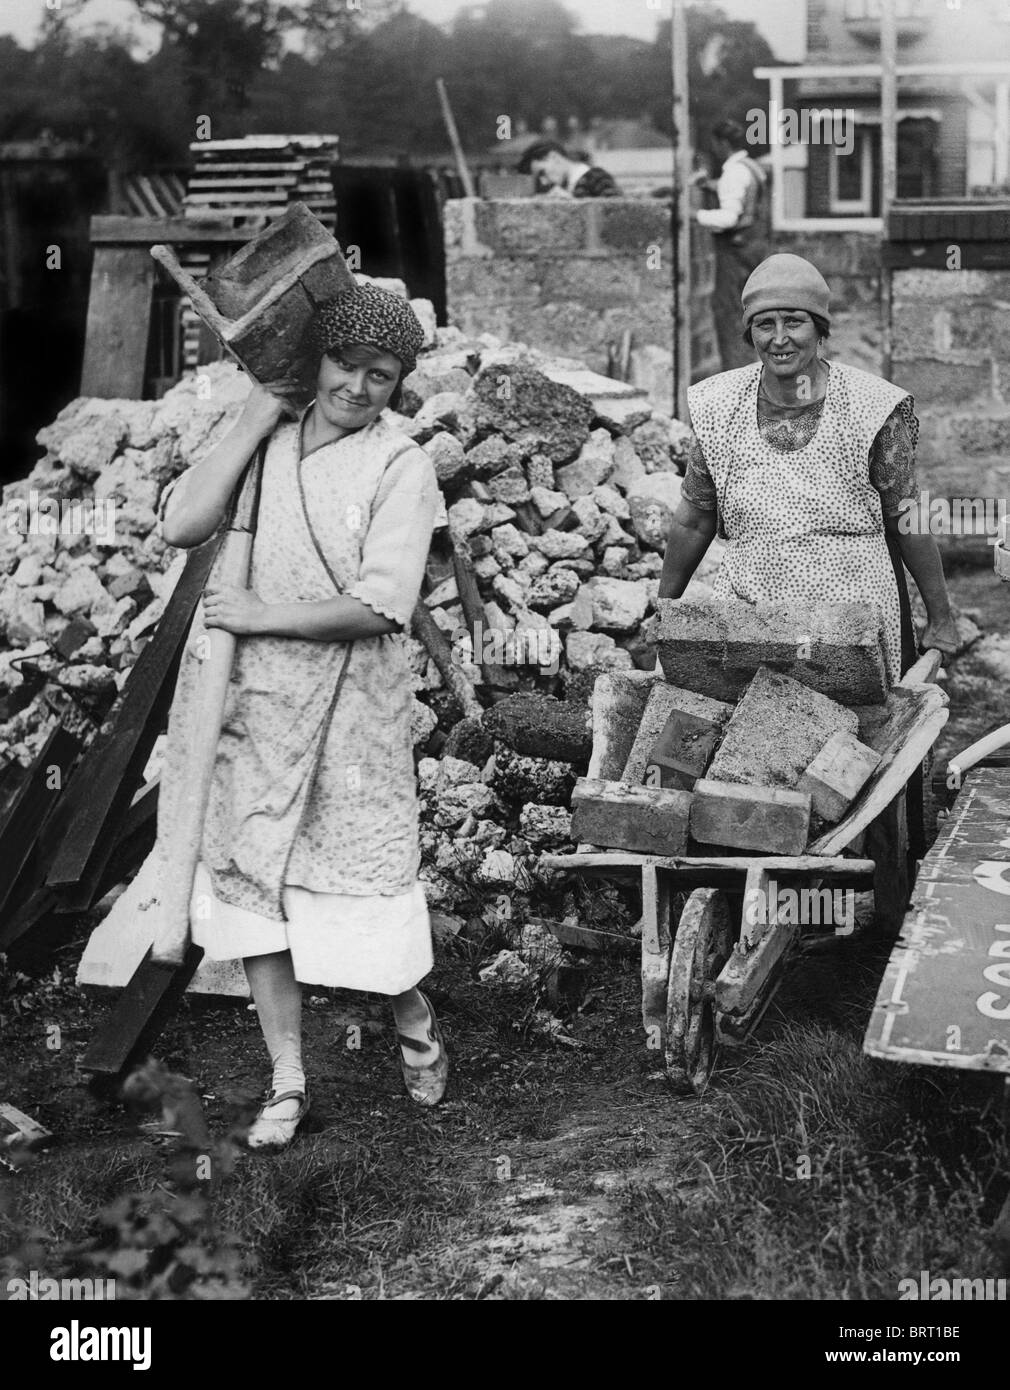 Truemmerfrauen, literally wreckage women, historic photograph, around 1947 - Stock Image